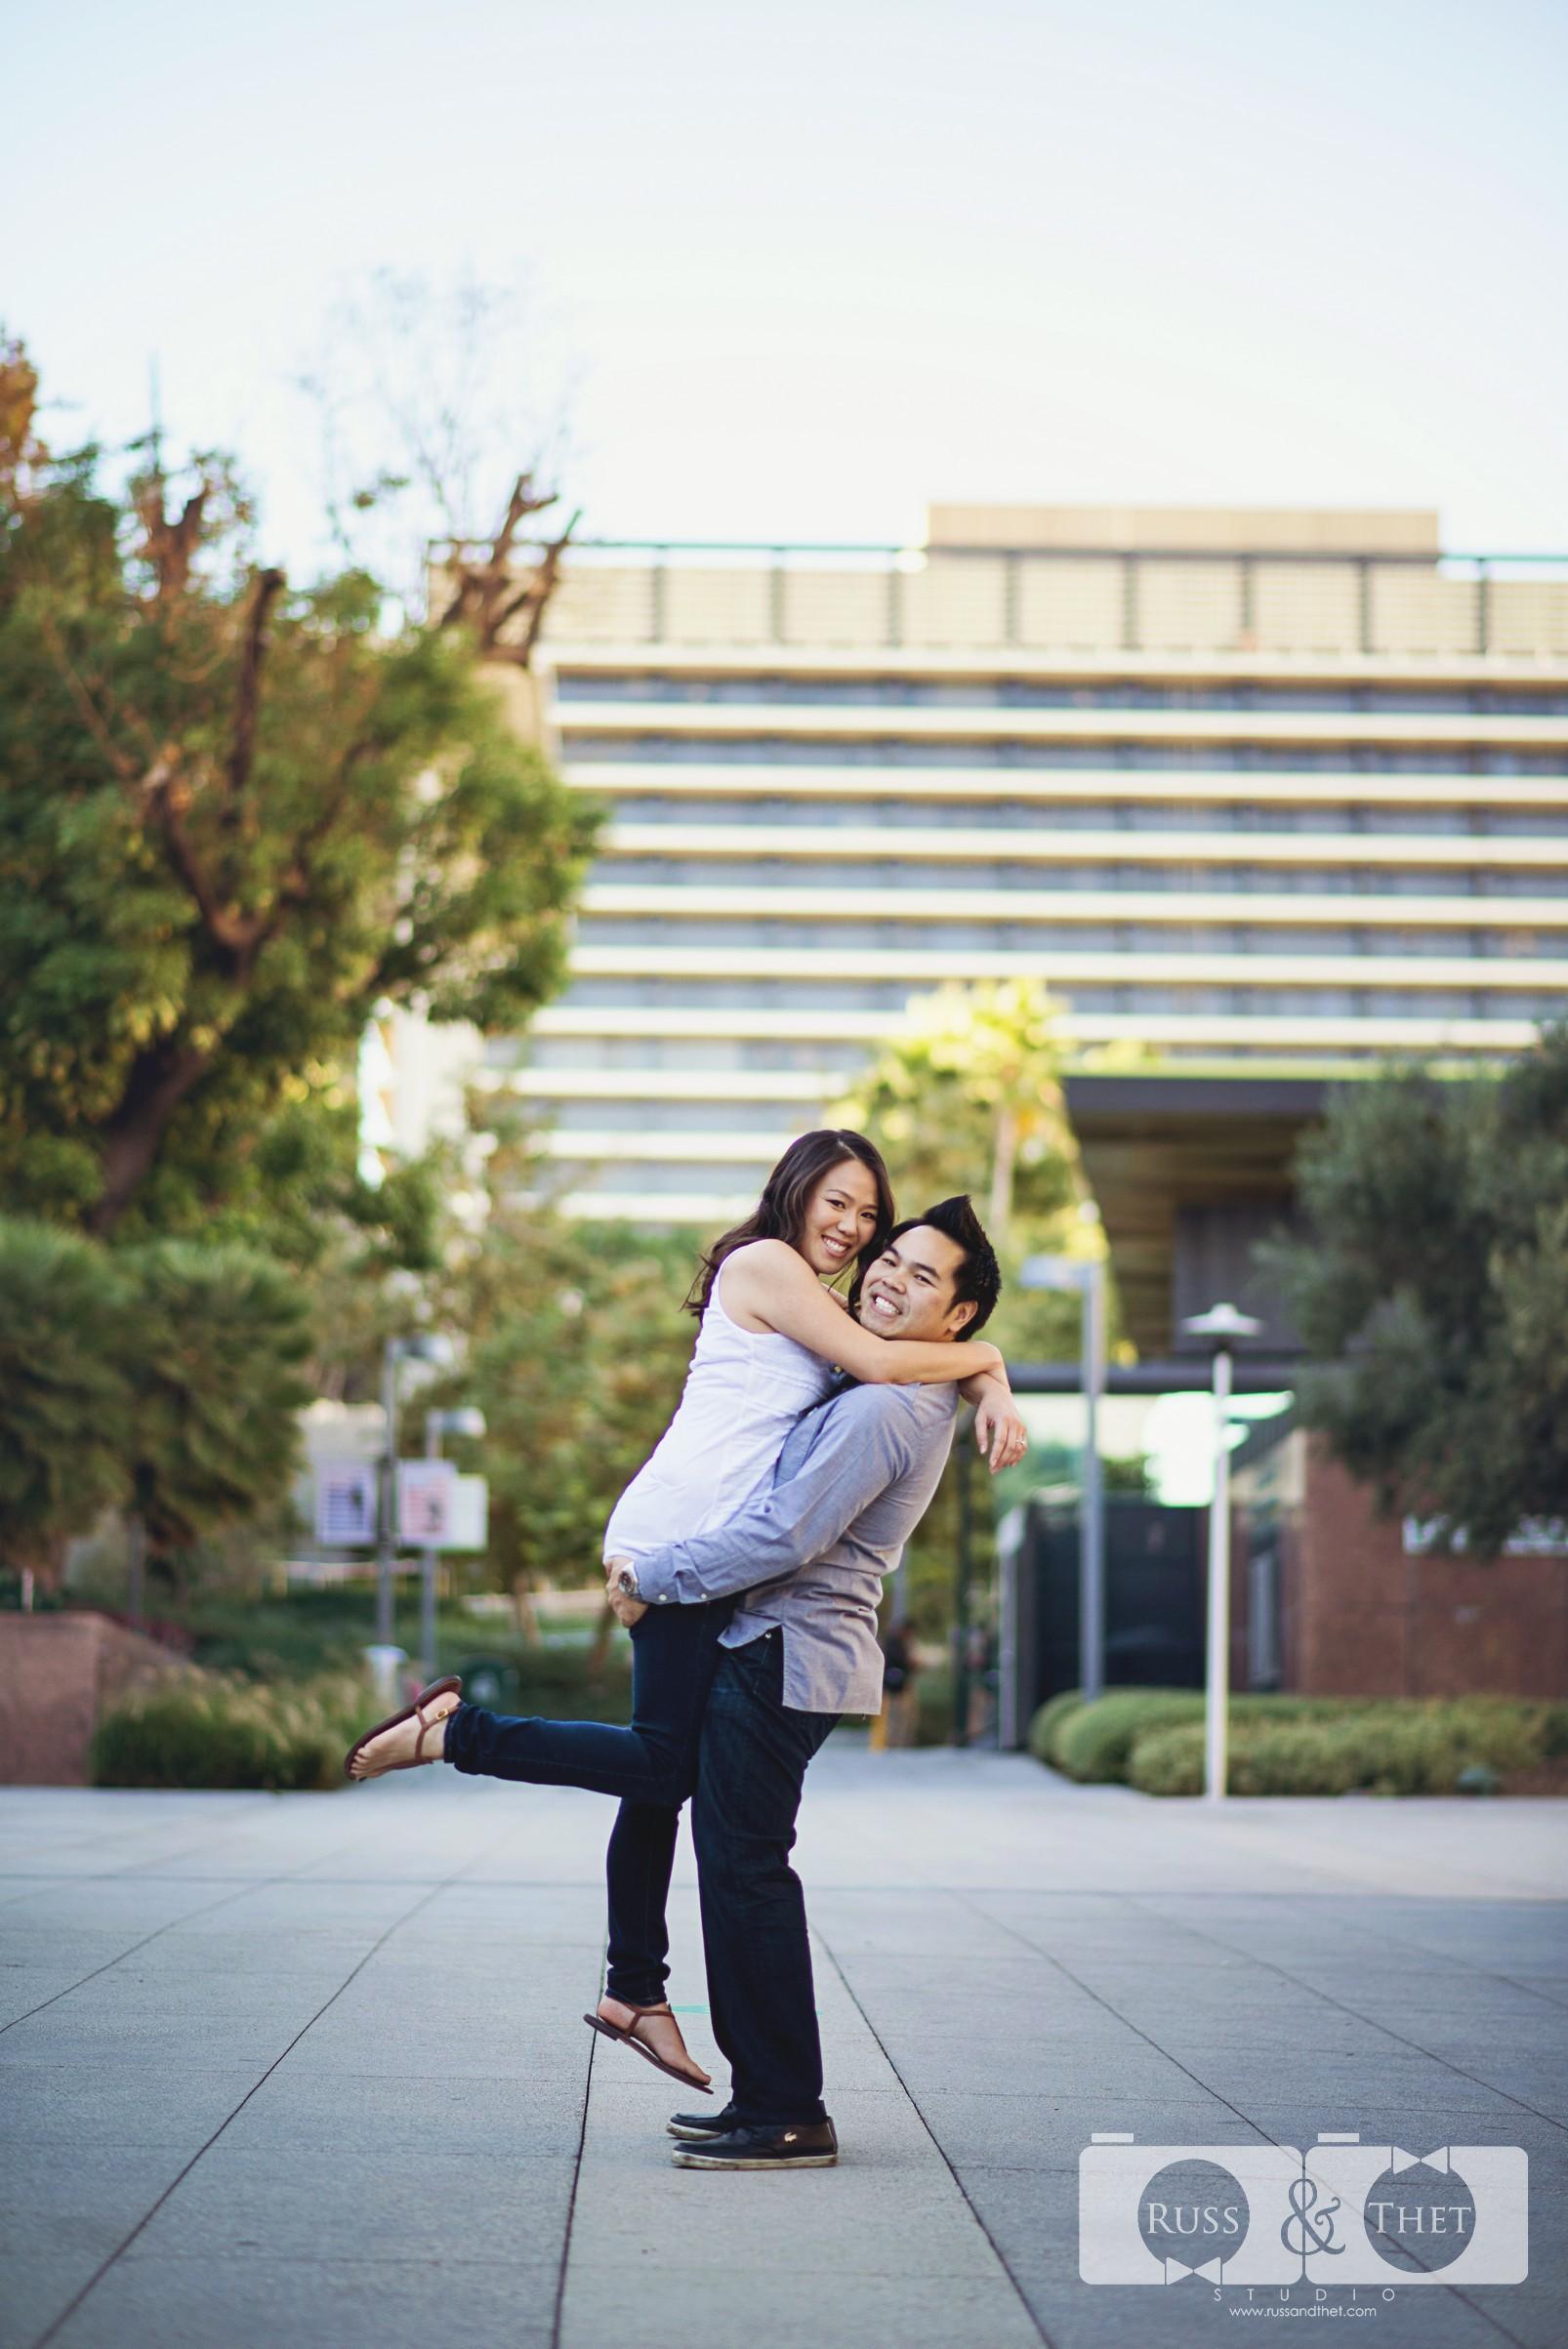 Emero_Lucinda_Downtown_Los_Angeles_Engagement_Photographer (5).jpg